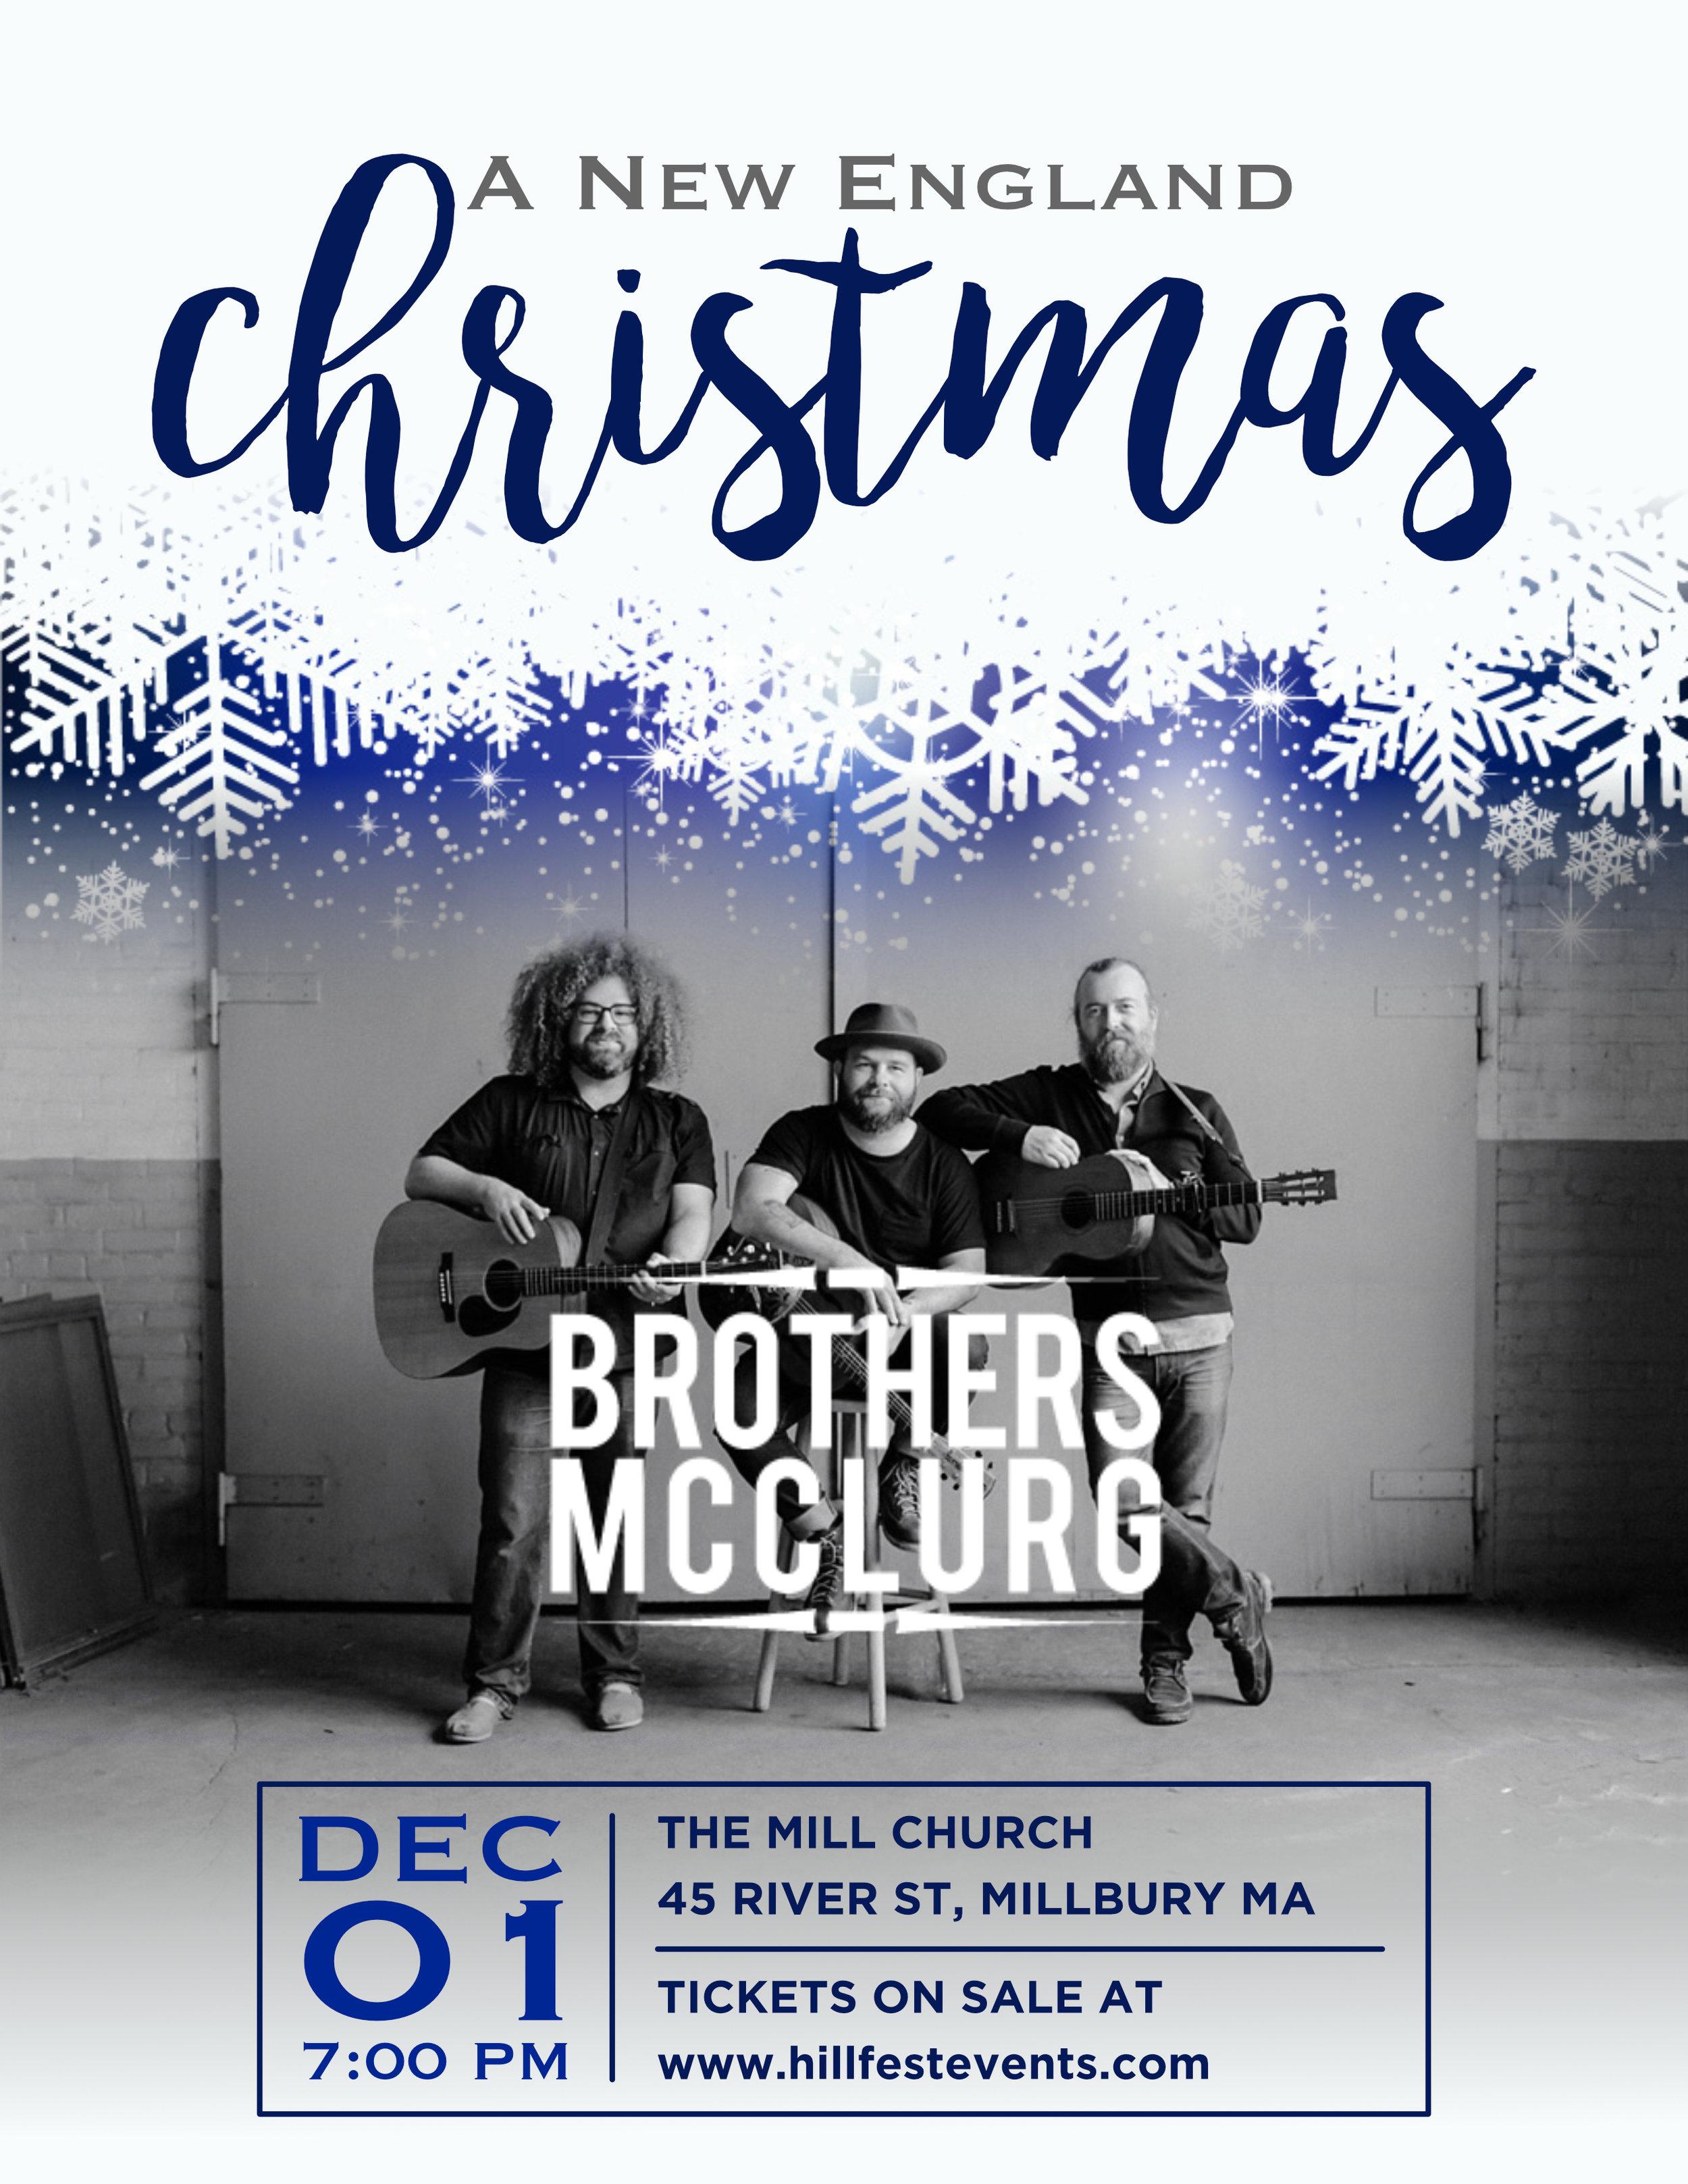 Brothers McClurg flyer_Mill Church.jpg